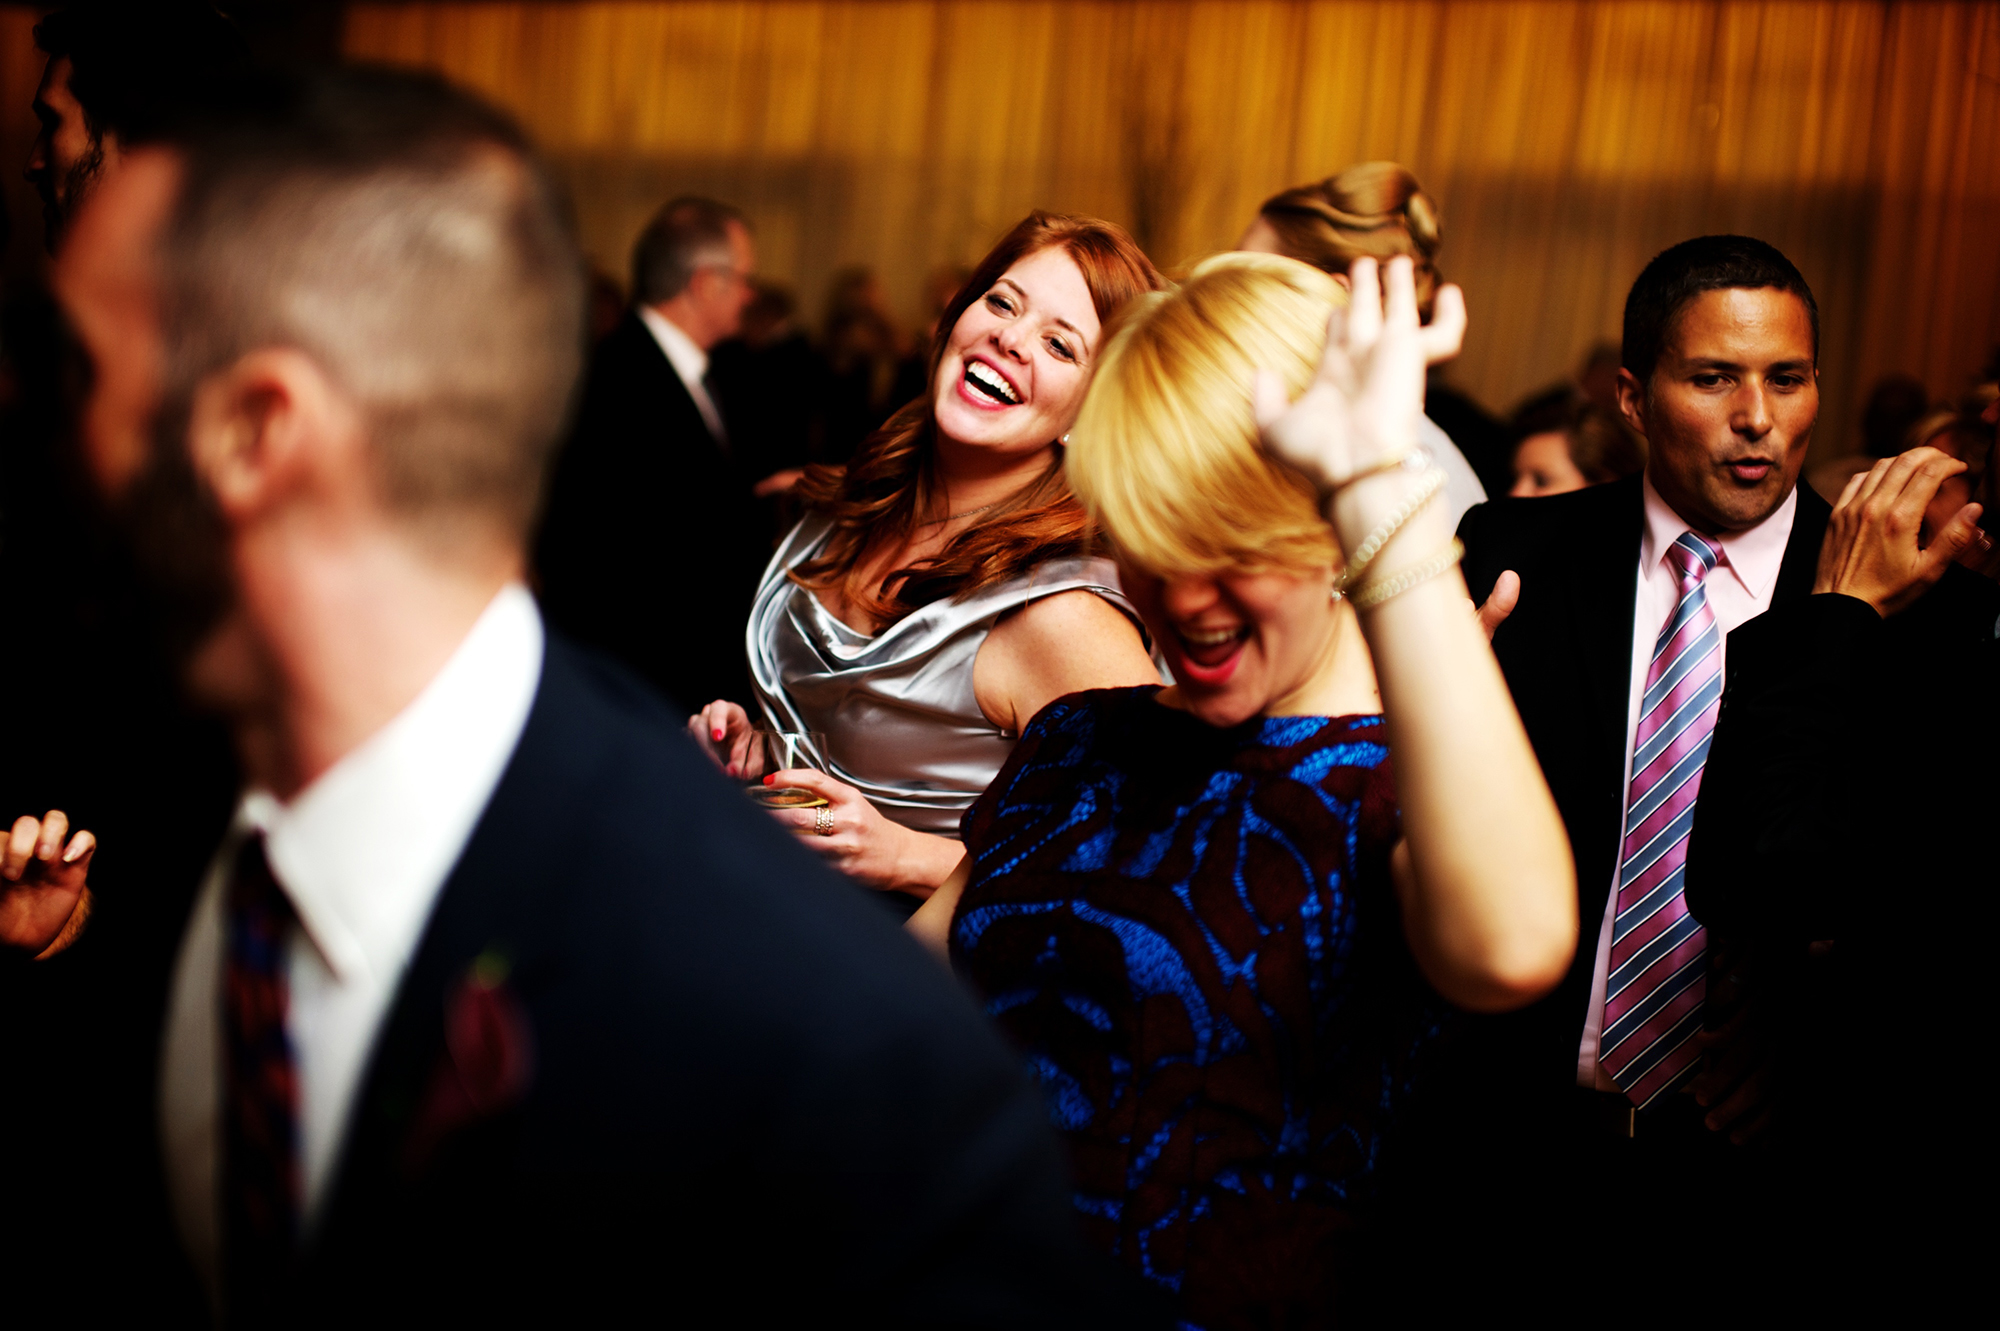 guest-dances-at-the-rhianna-diamond-ball-lionell-ritchie.jpg